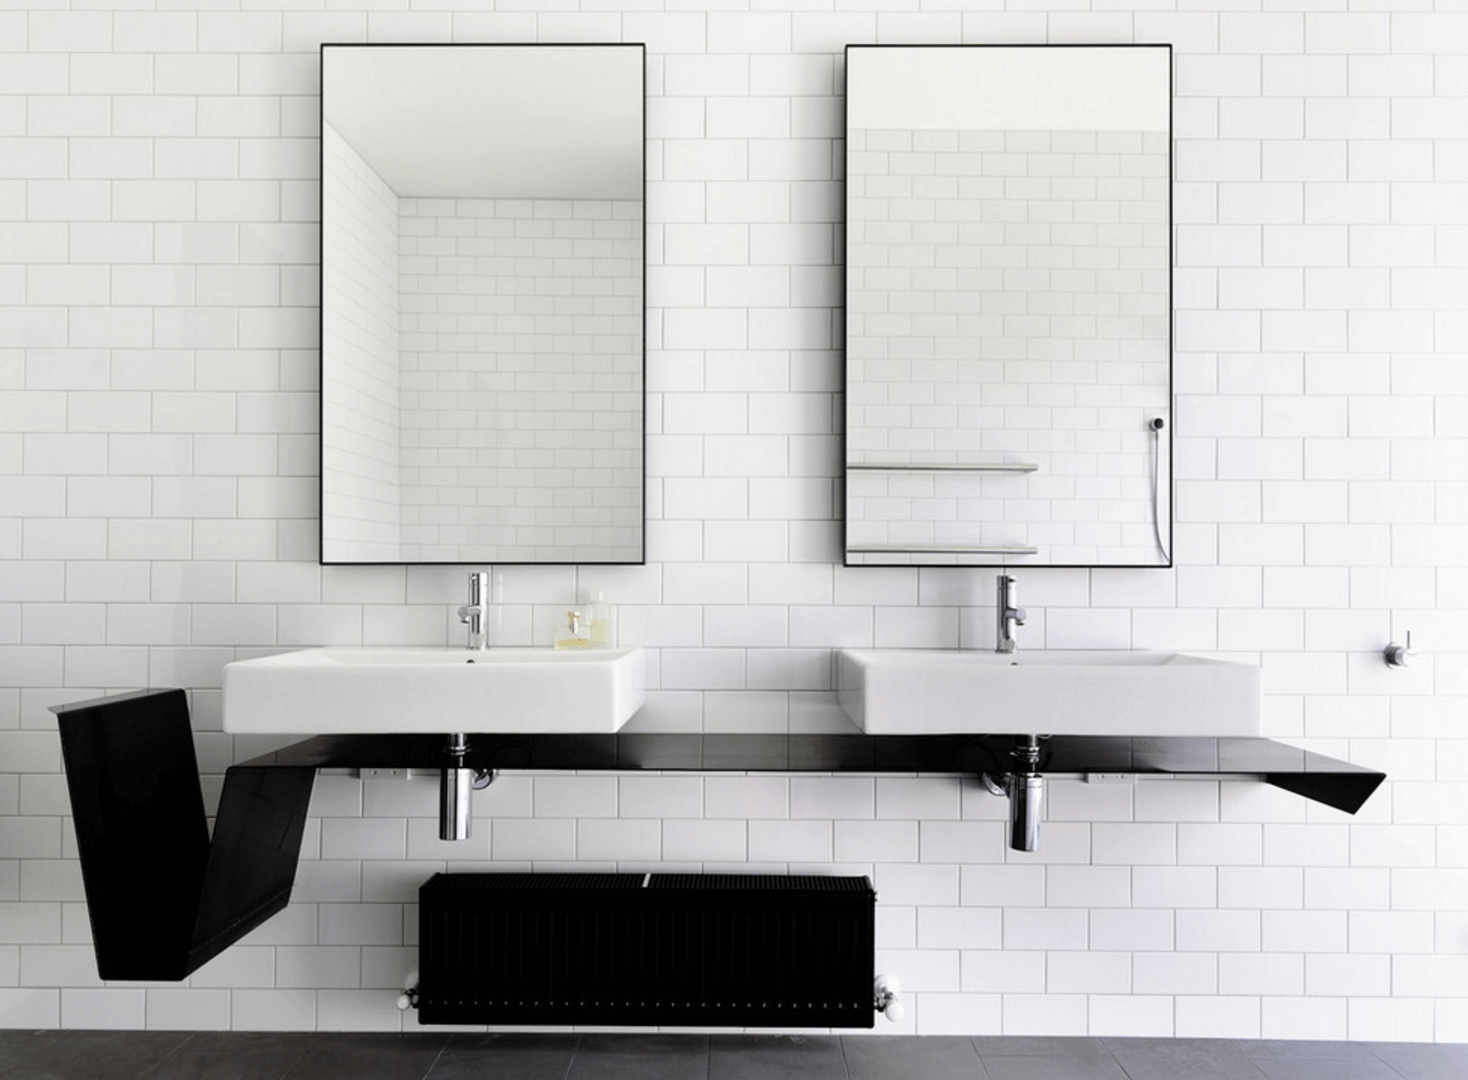 Bathroom : Smart Bathroom Mirror Ideas With Use Two Rectangular ...